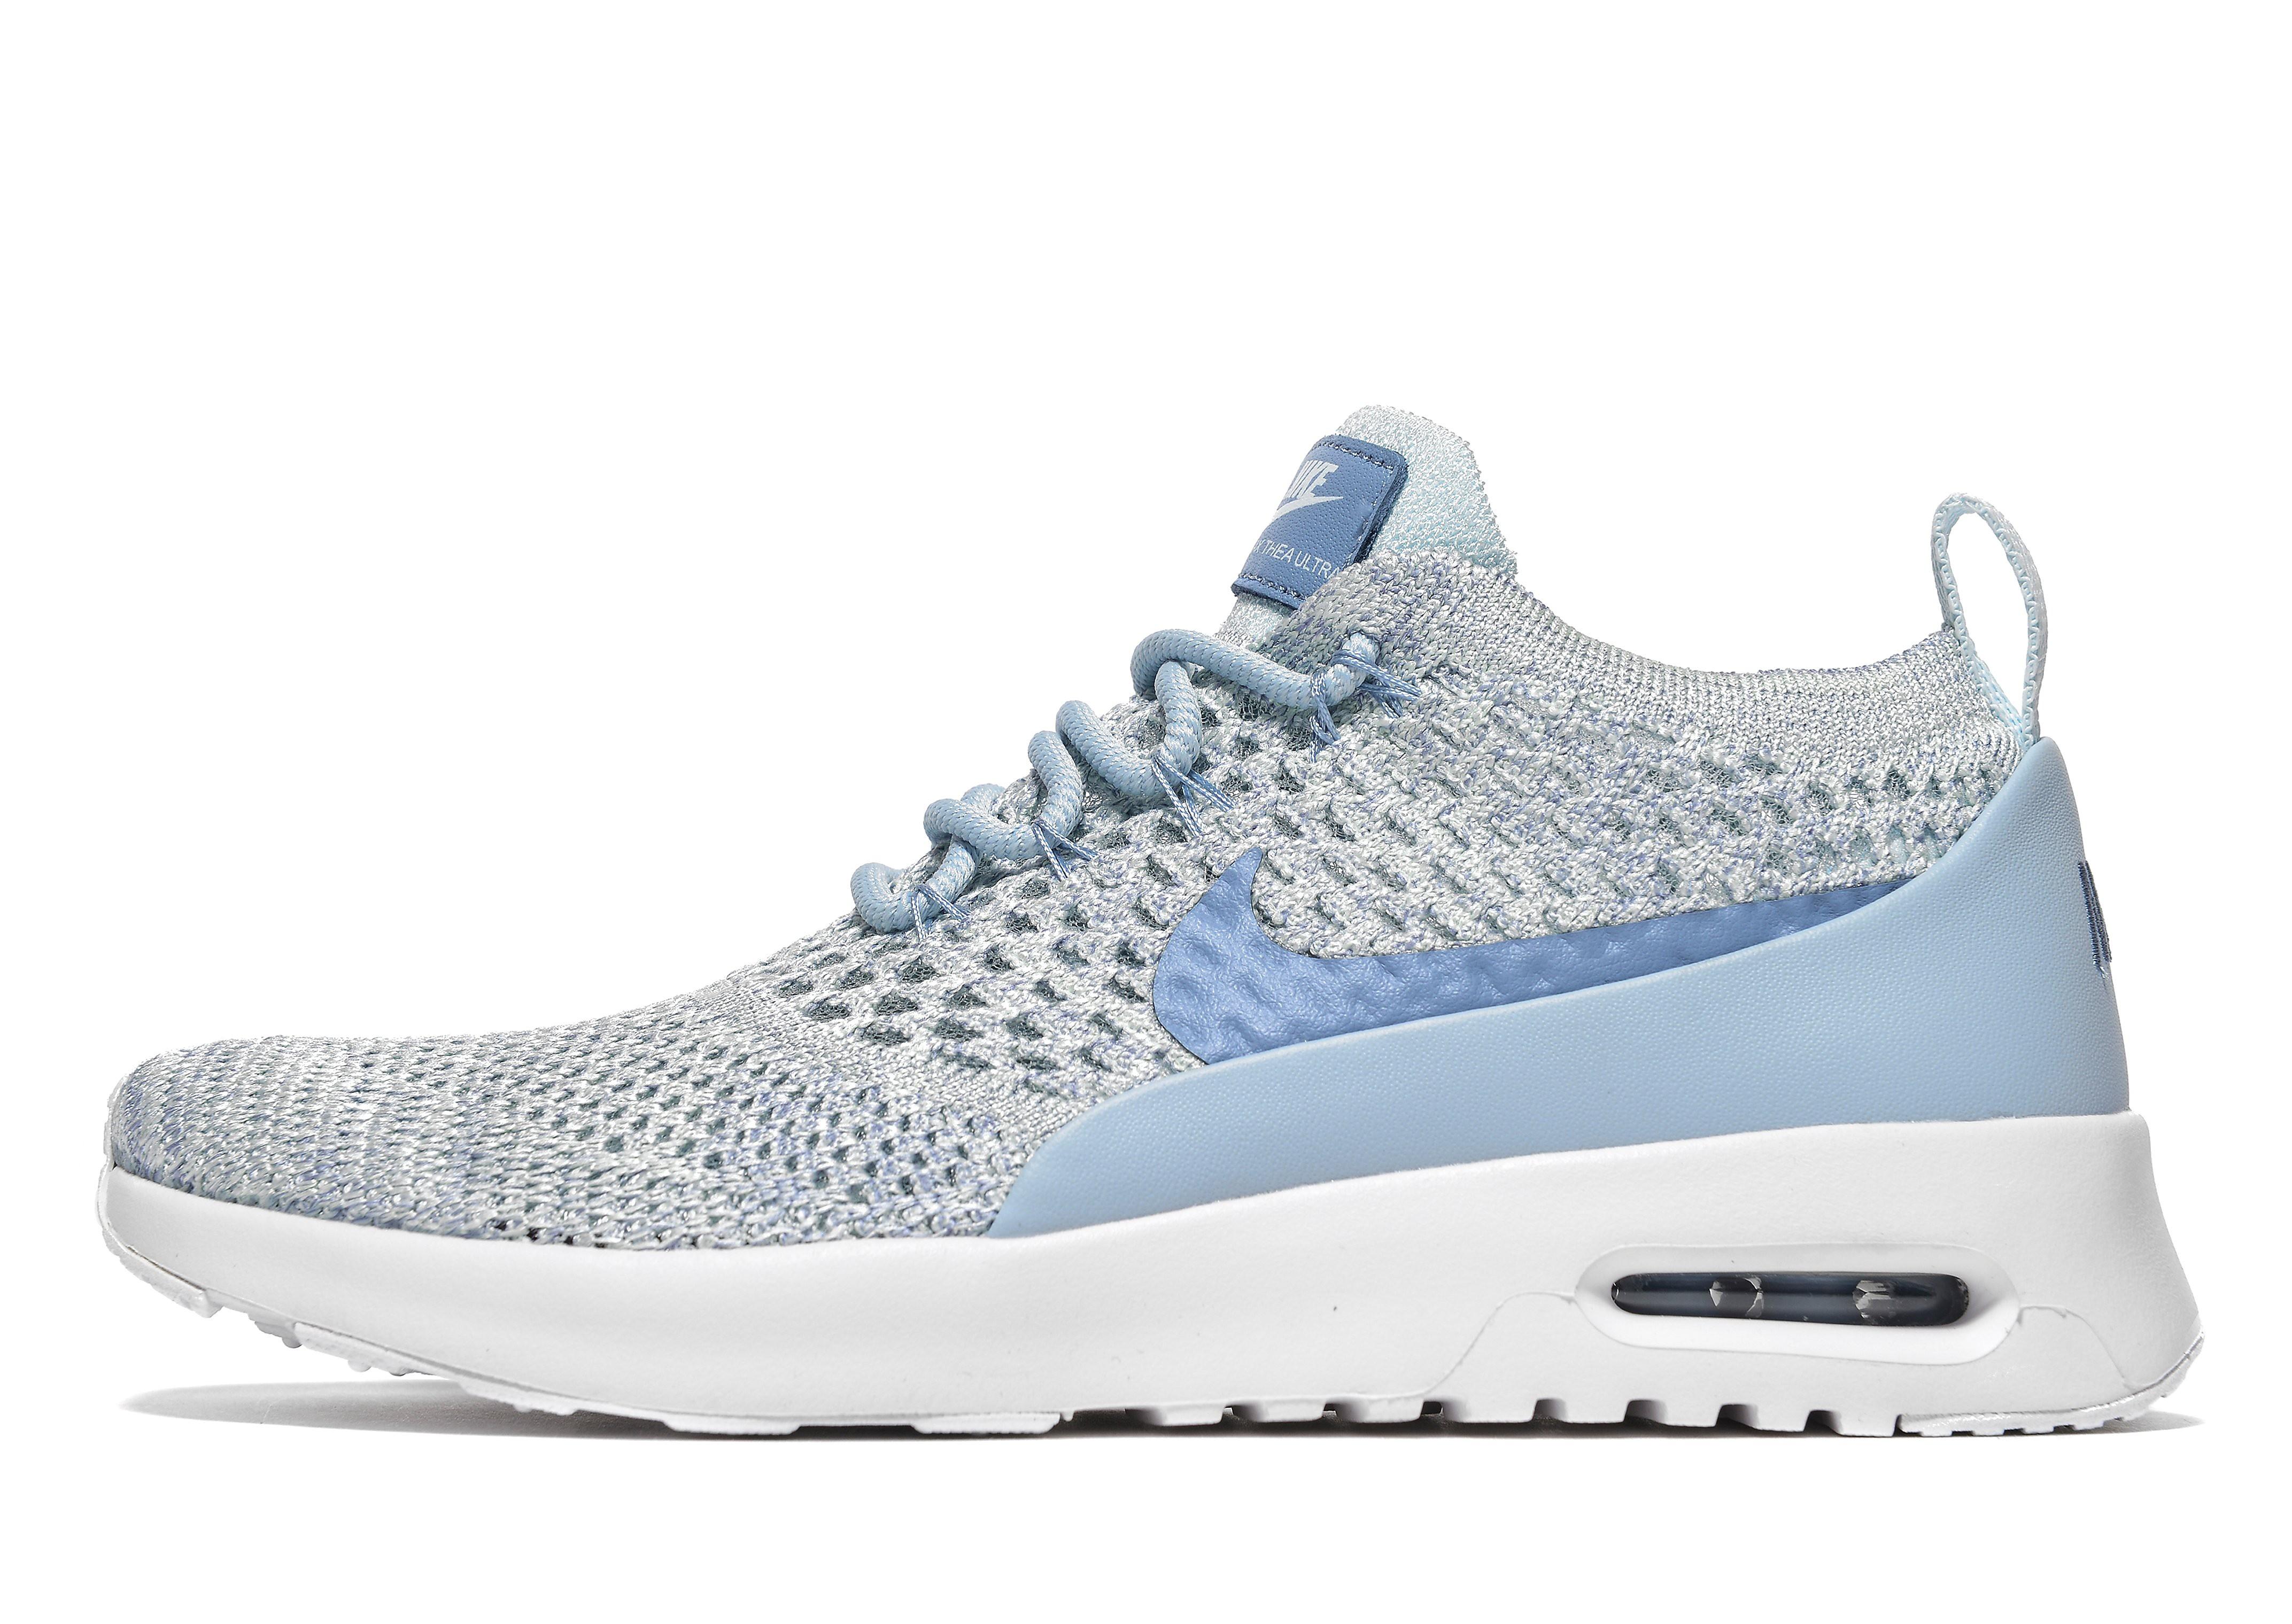 Nike Air Max Thea Flyknit Women's